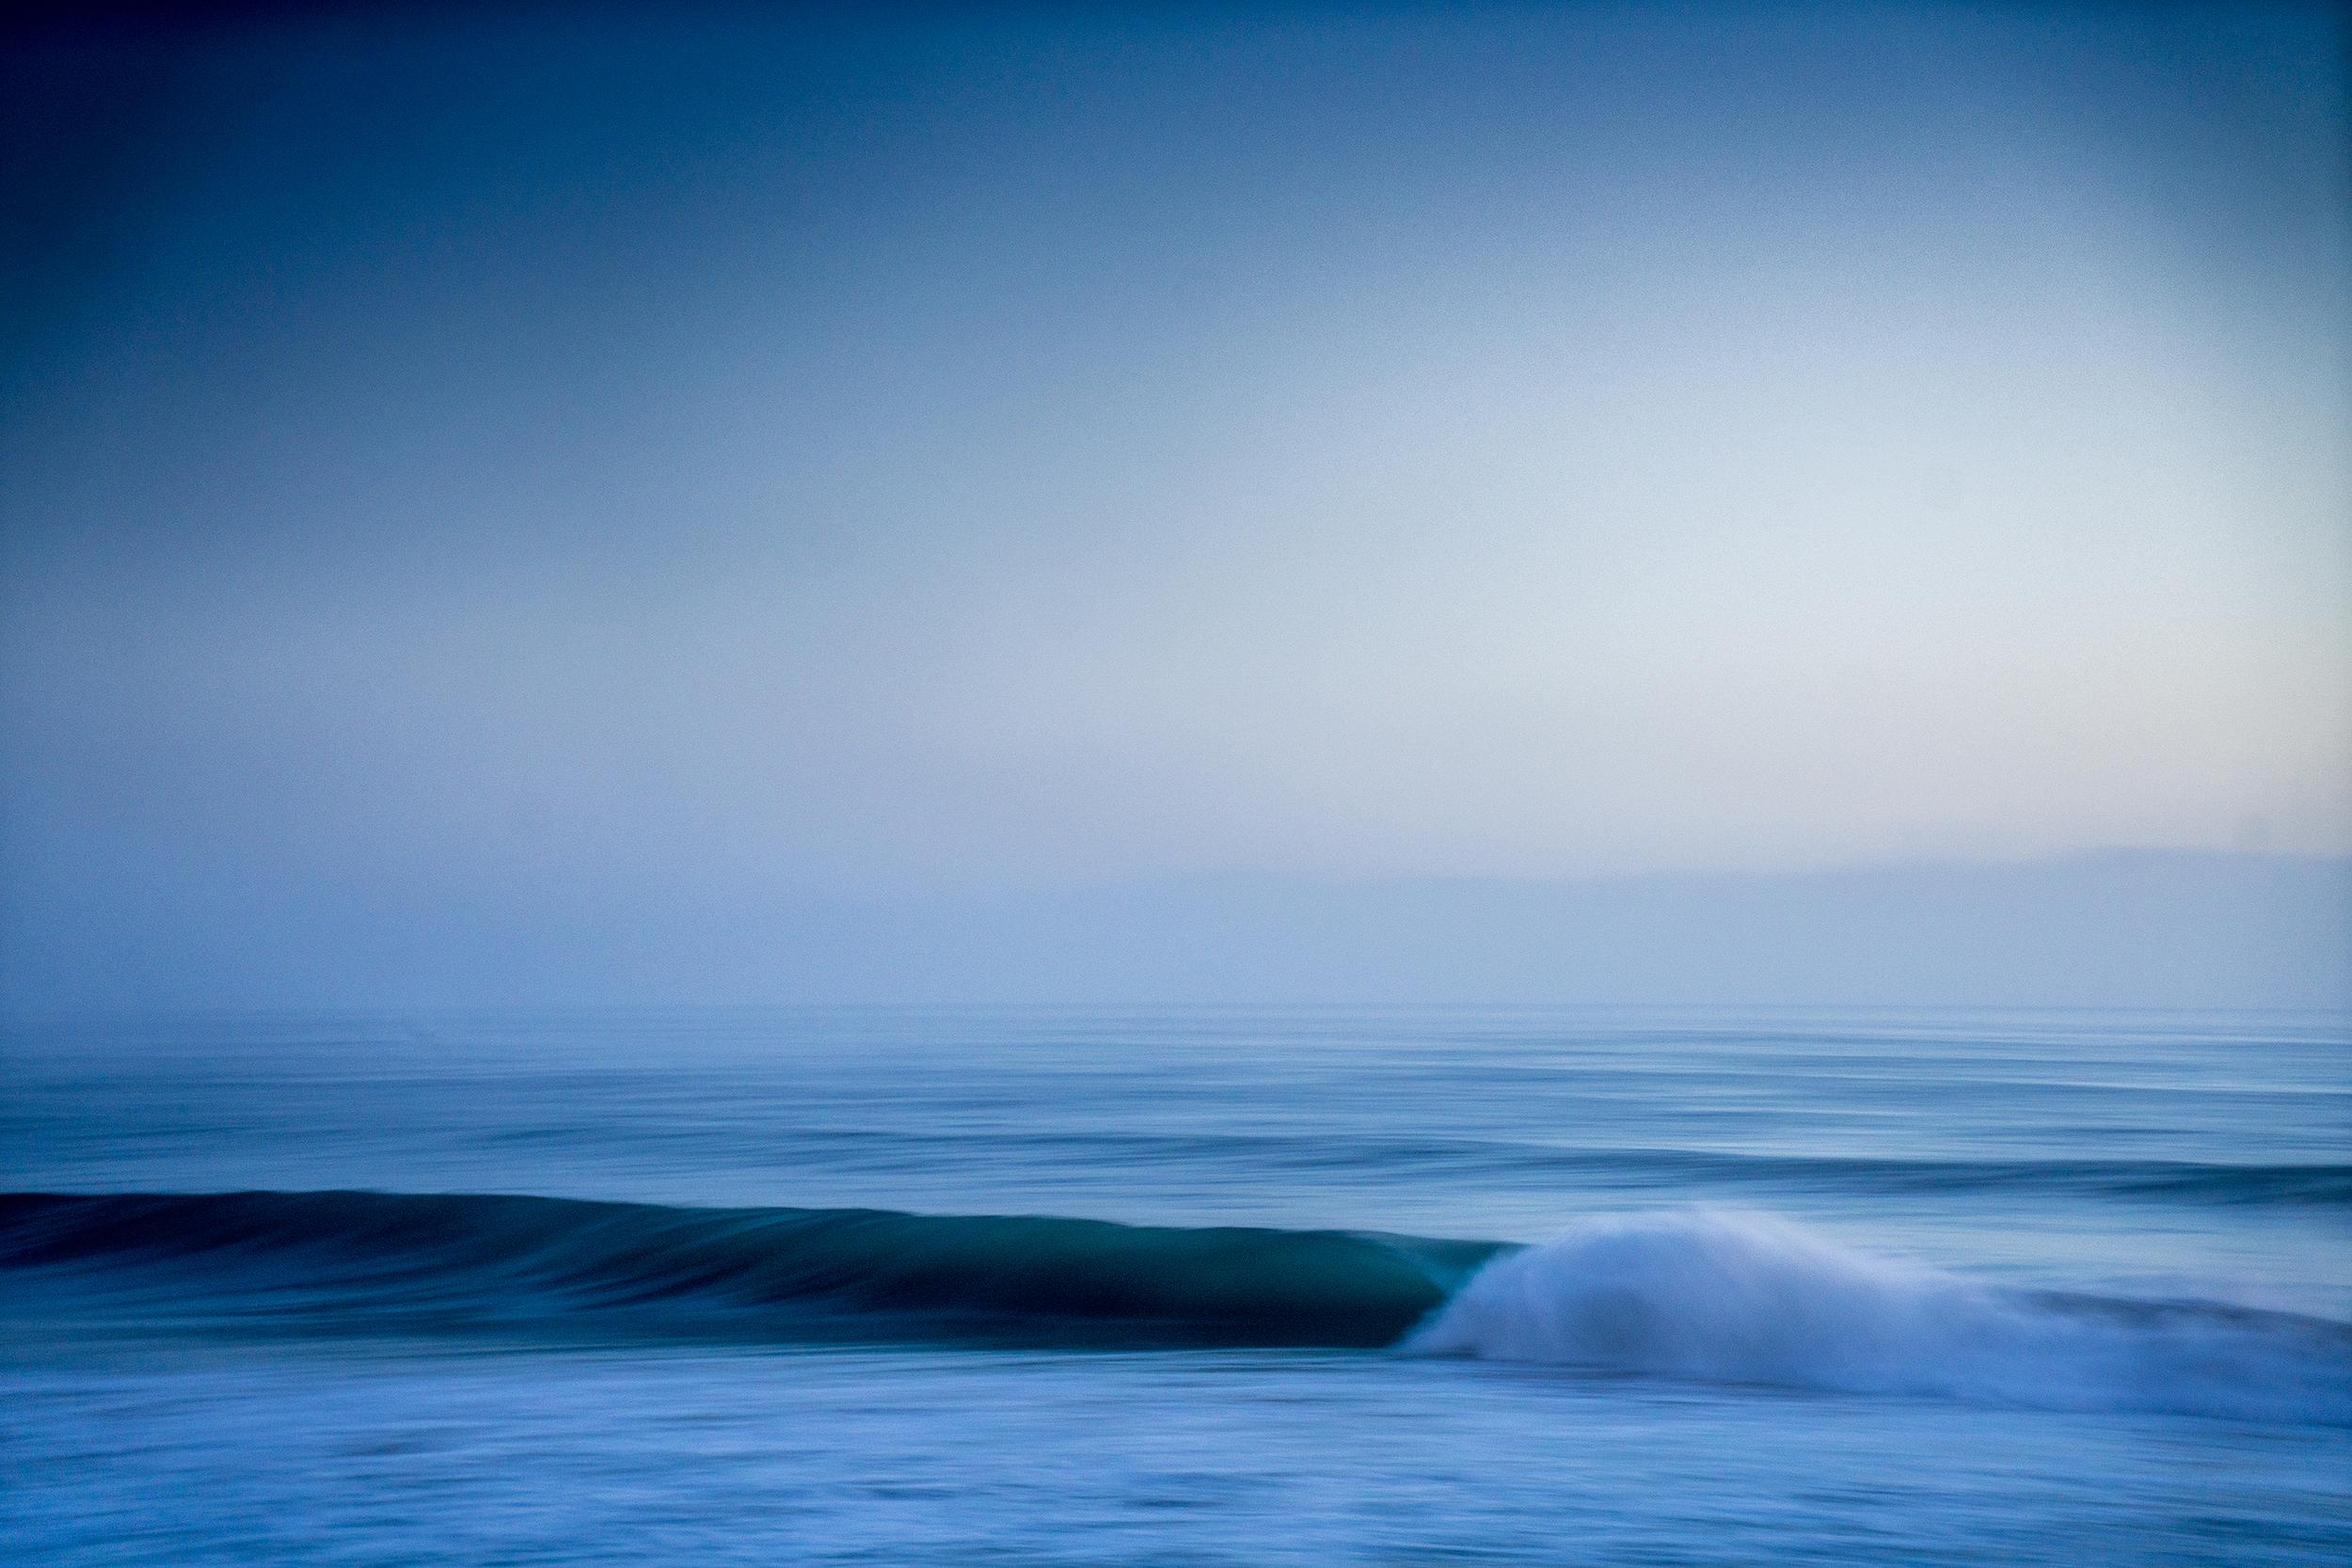 East Coast - 2016 - Moonlight Serenity